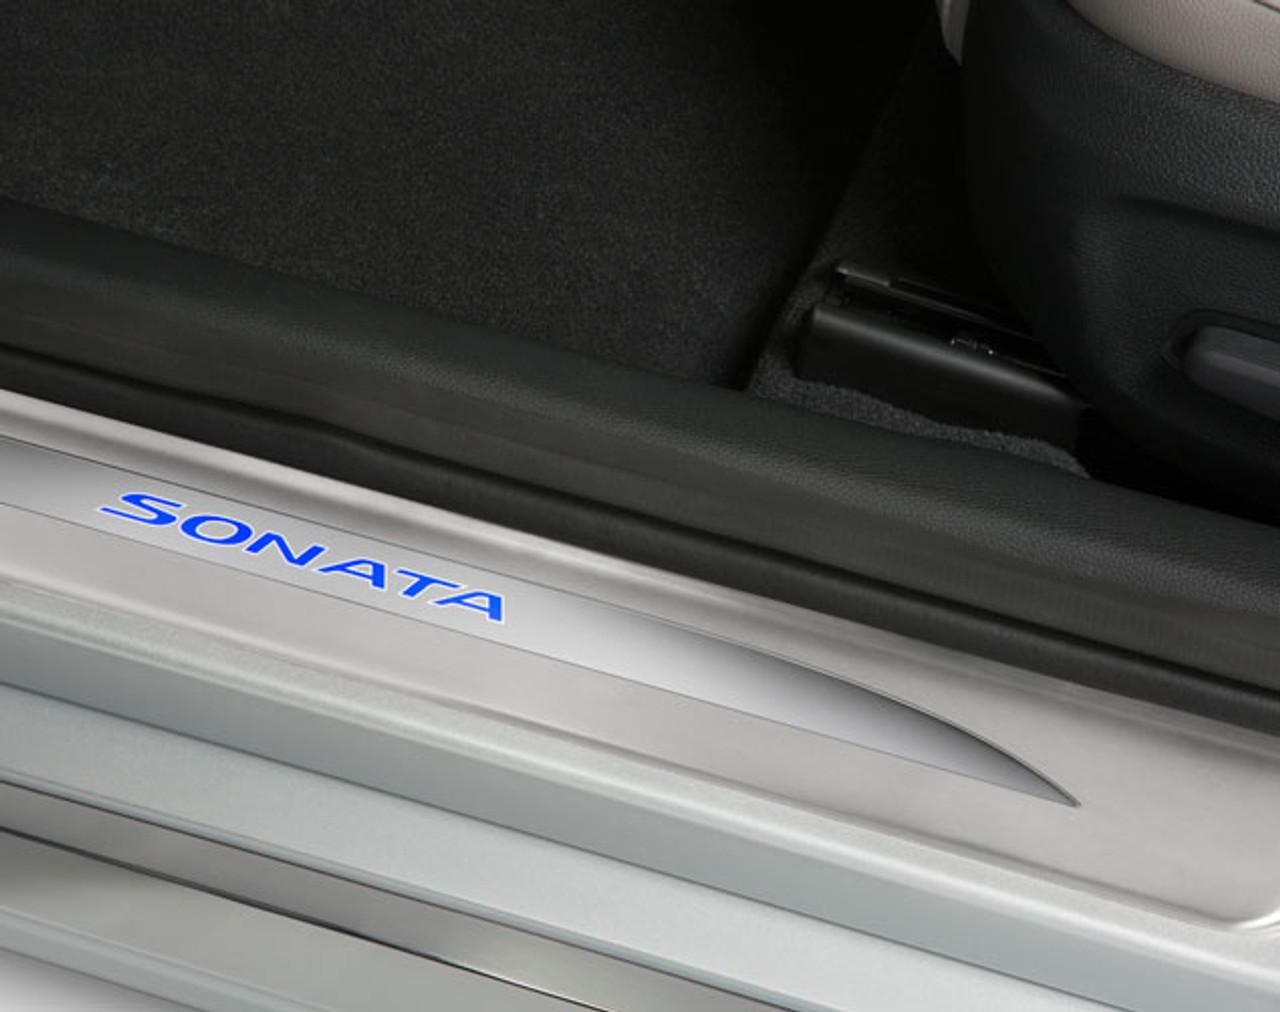 Hyundai Sonata LED Door Sill Plates & Hyundai Sonata LED Door Sill Plates - Free Shipping | Hyundai Shop